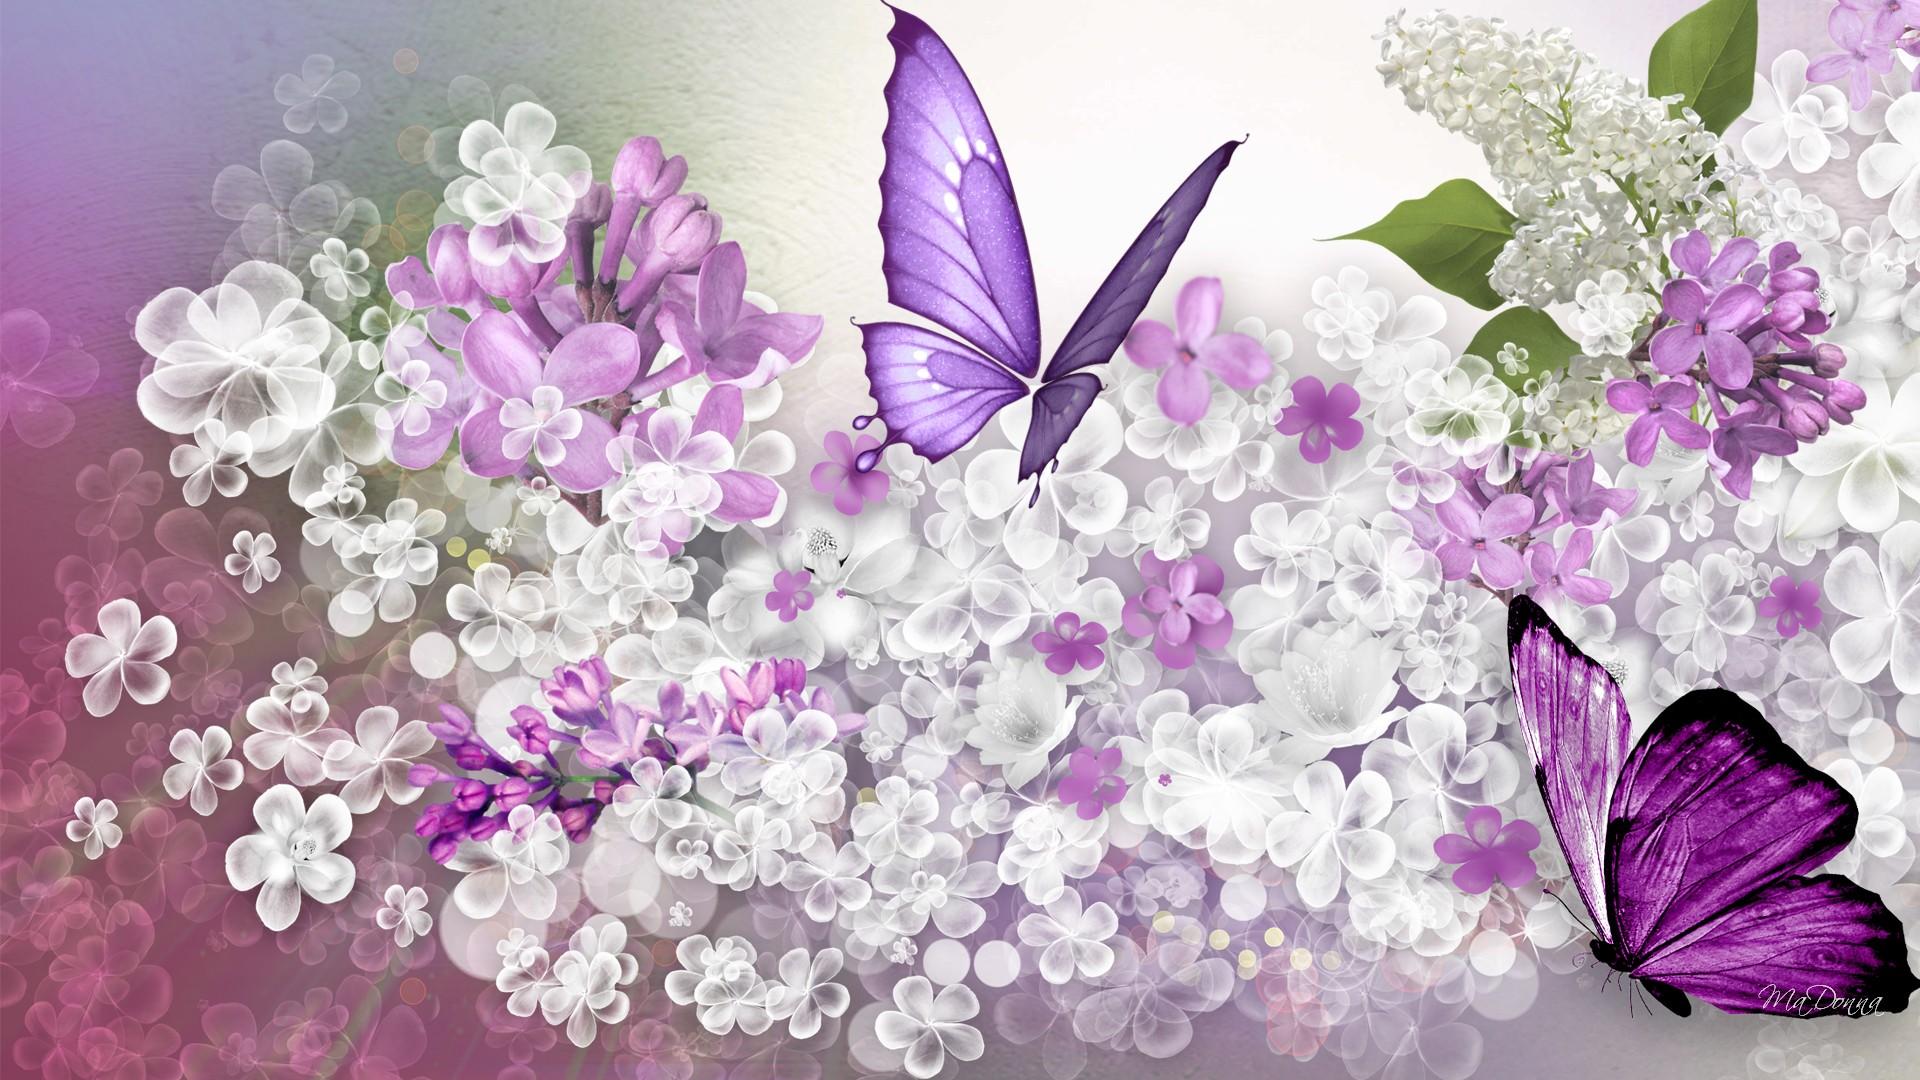 44 Lilac Background Wallpaper On Wallpapersafari